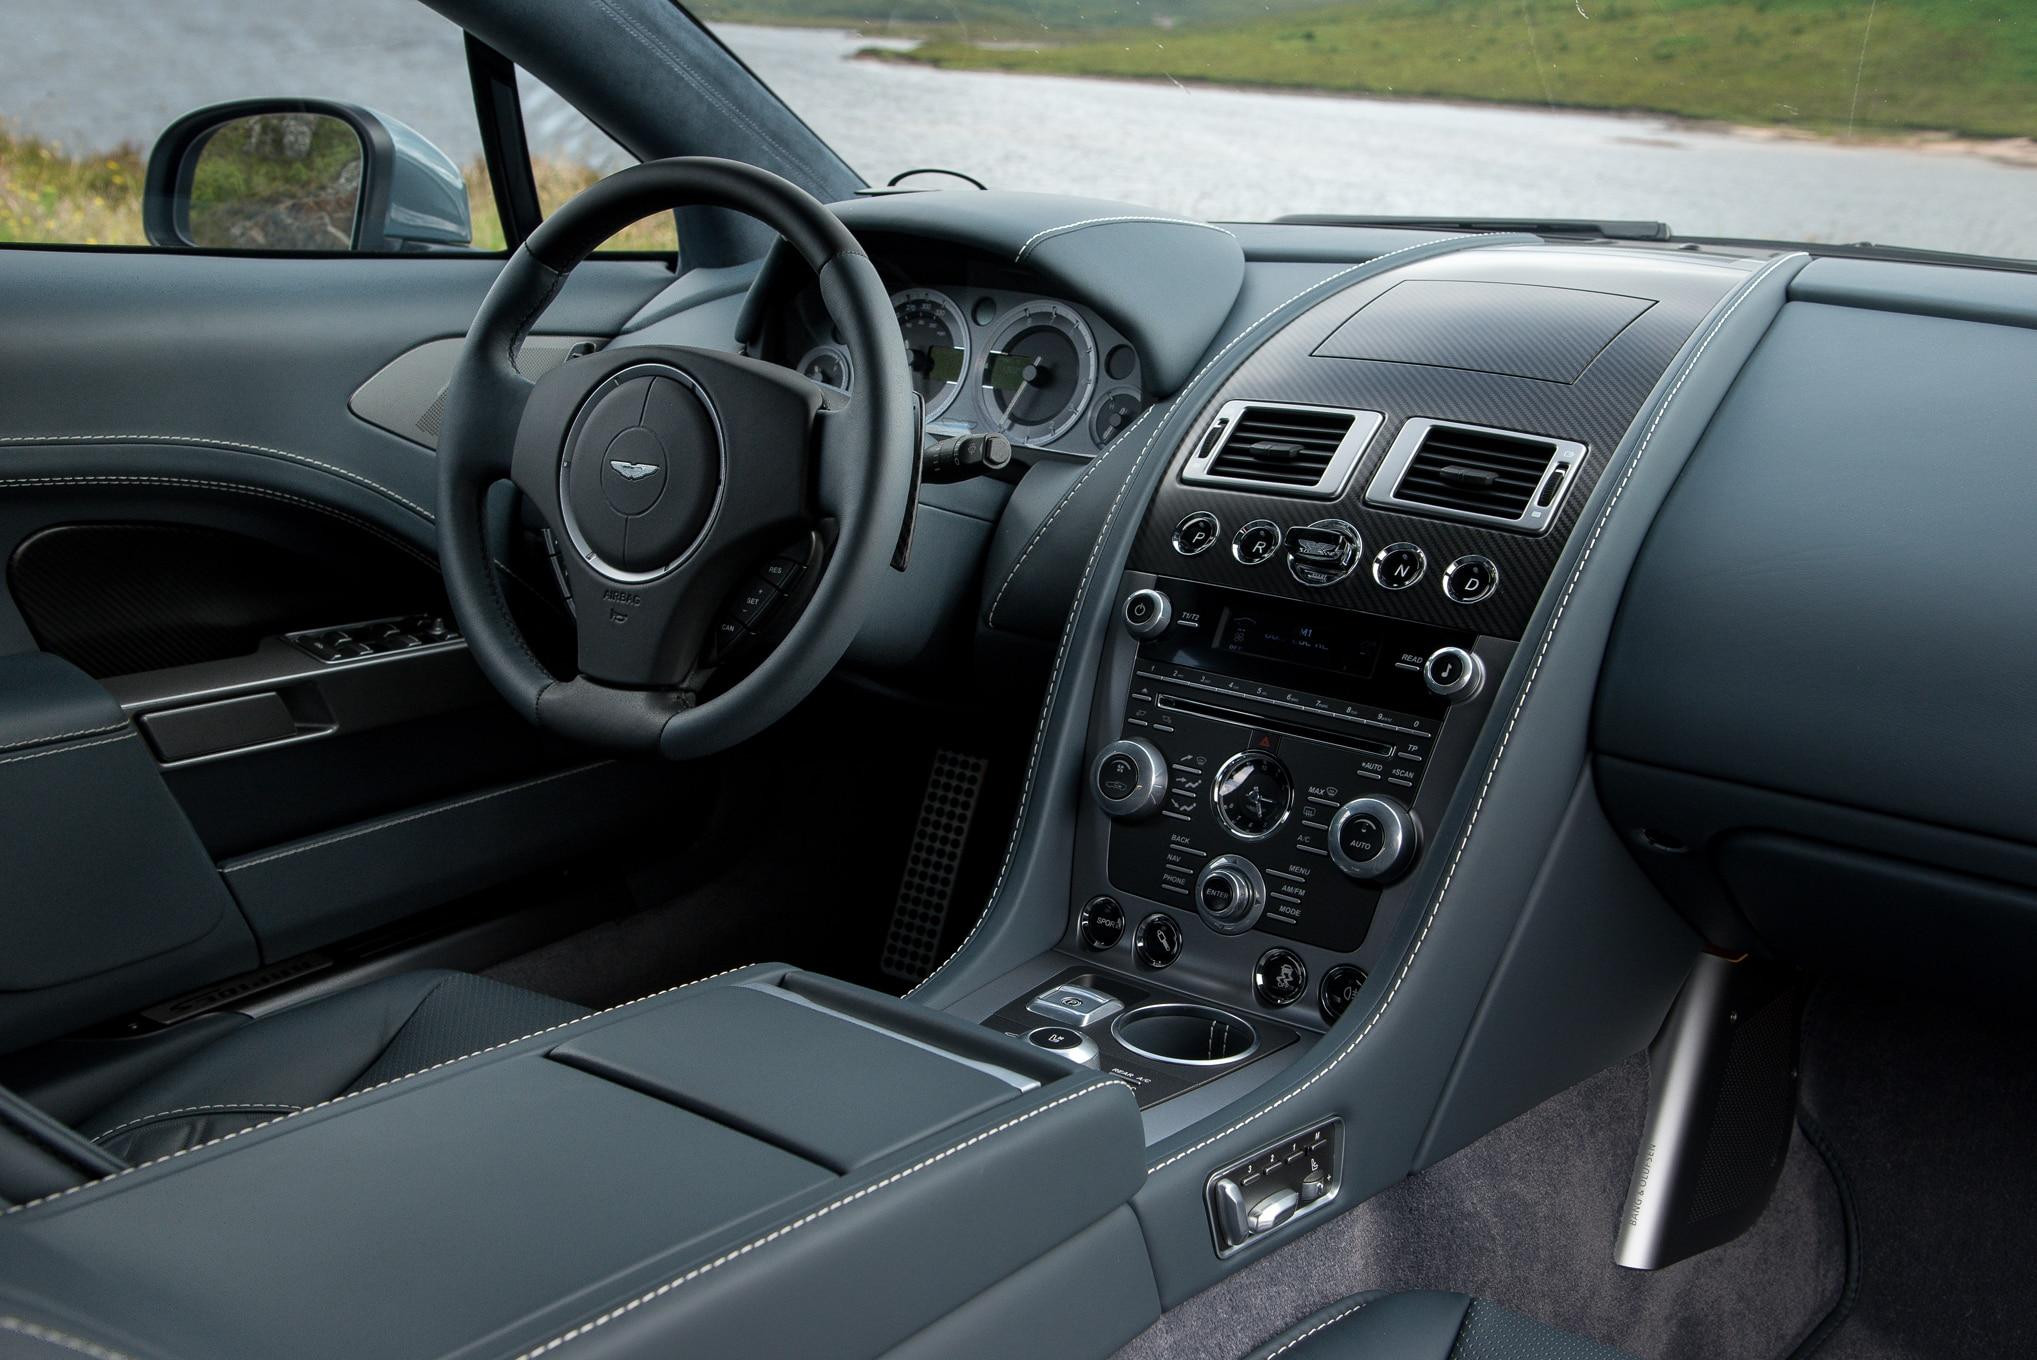 2015 Aston Martin Vanquish Rapide S Review